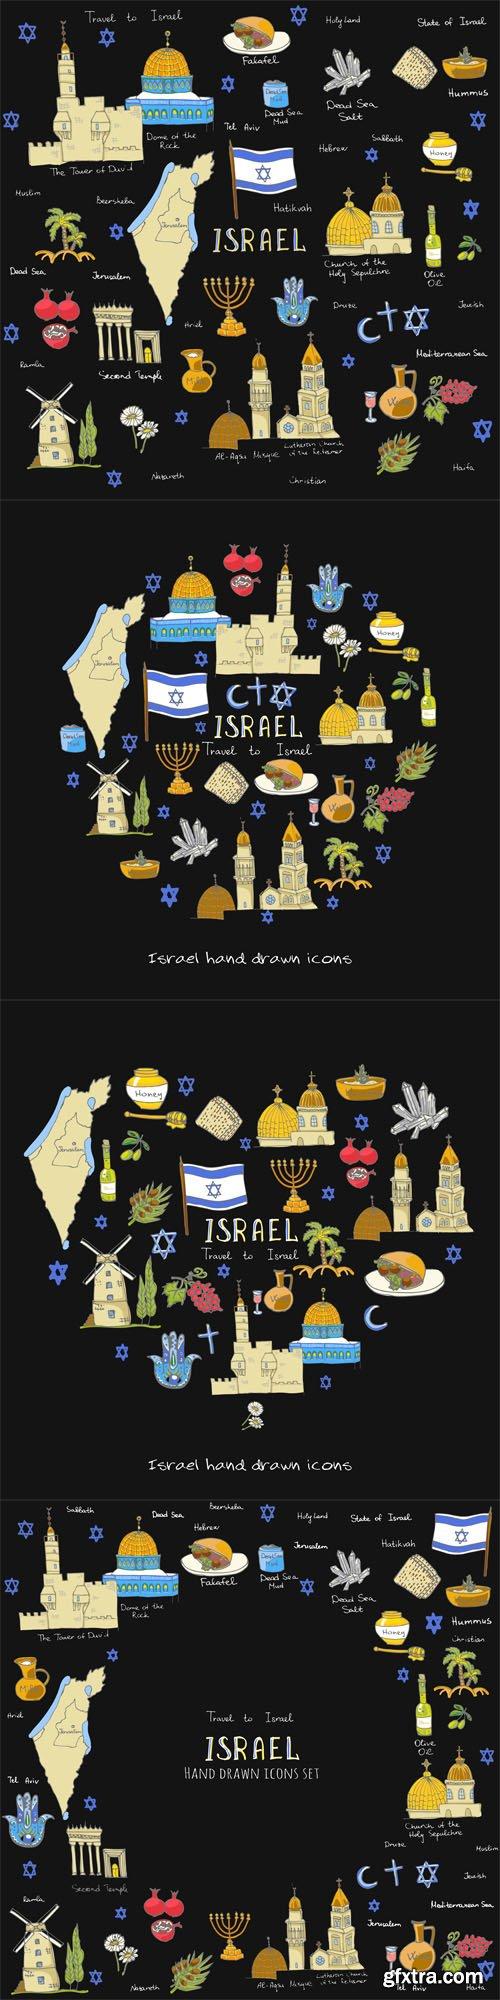 Set of hand drawn Israel icons - Vectors A000012